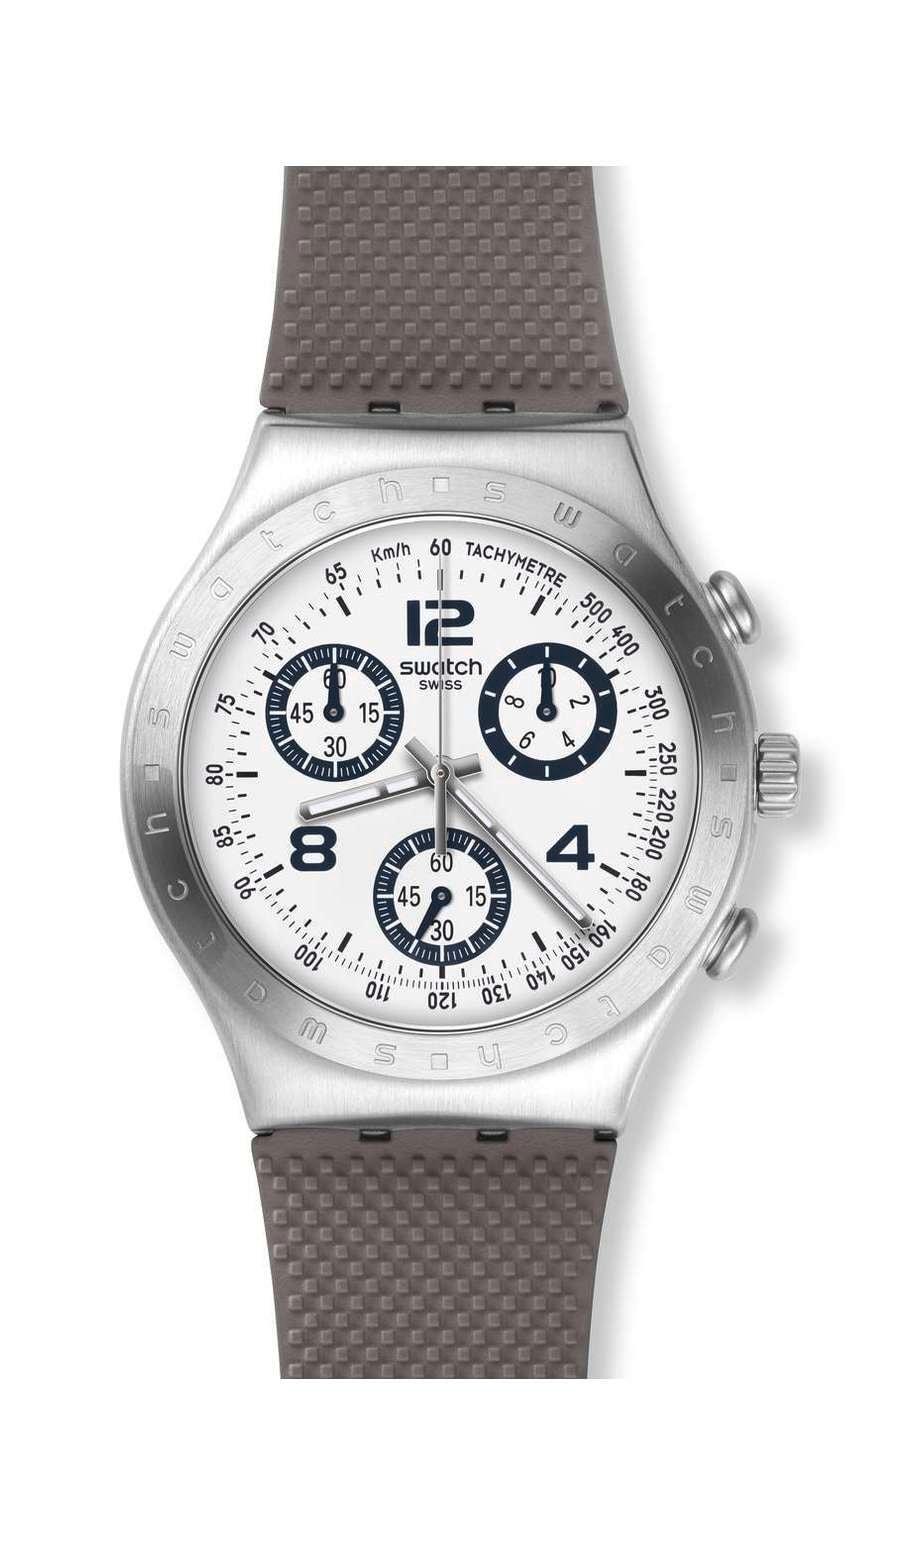 Swatch - CLASSYLICIOUS - 1